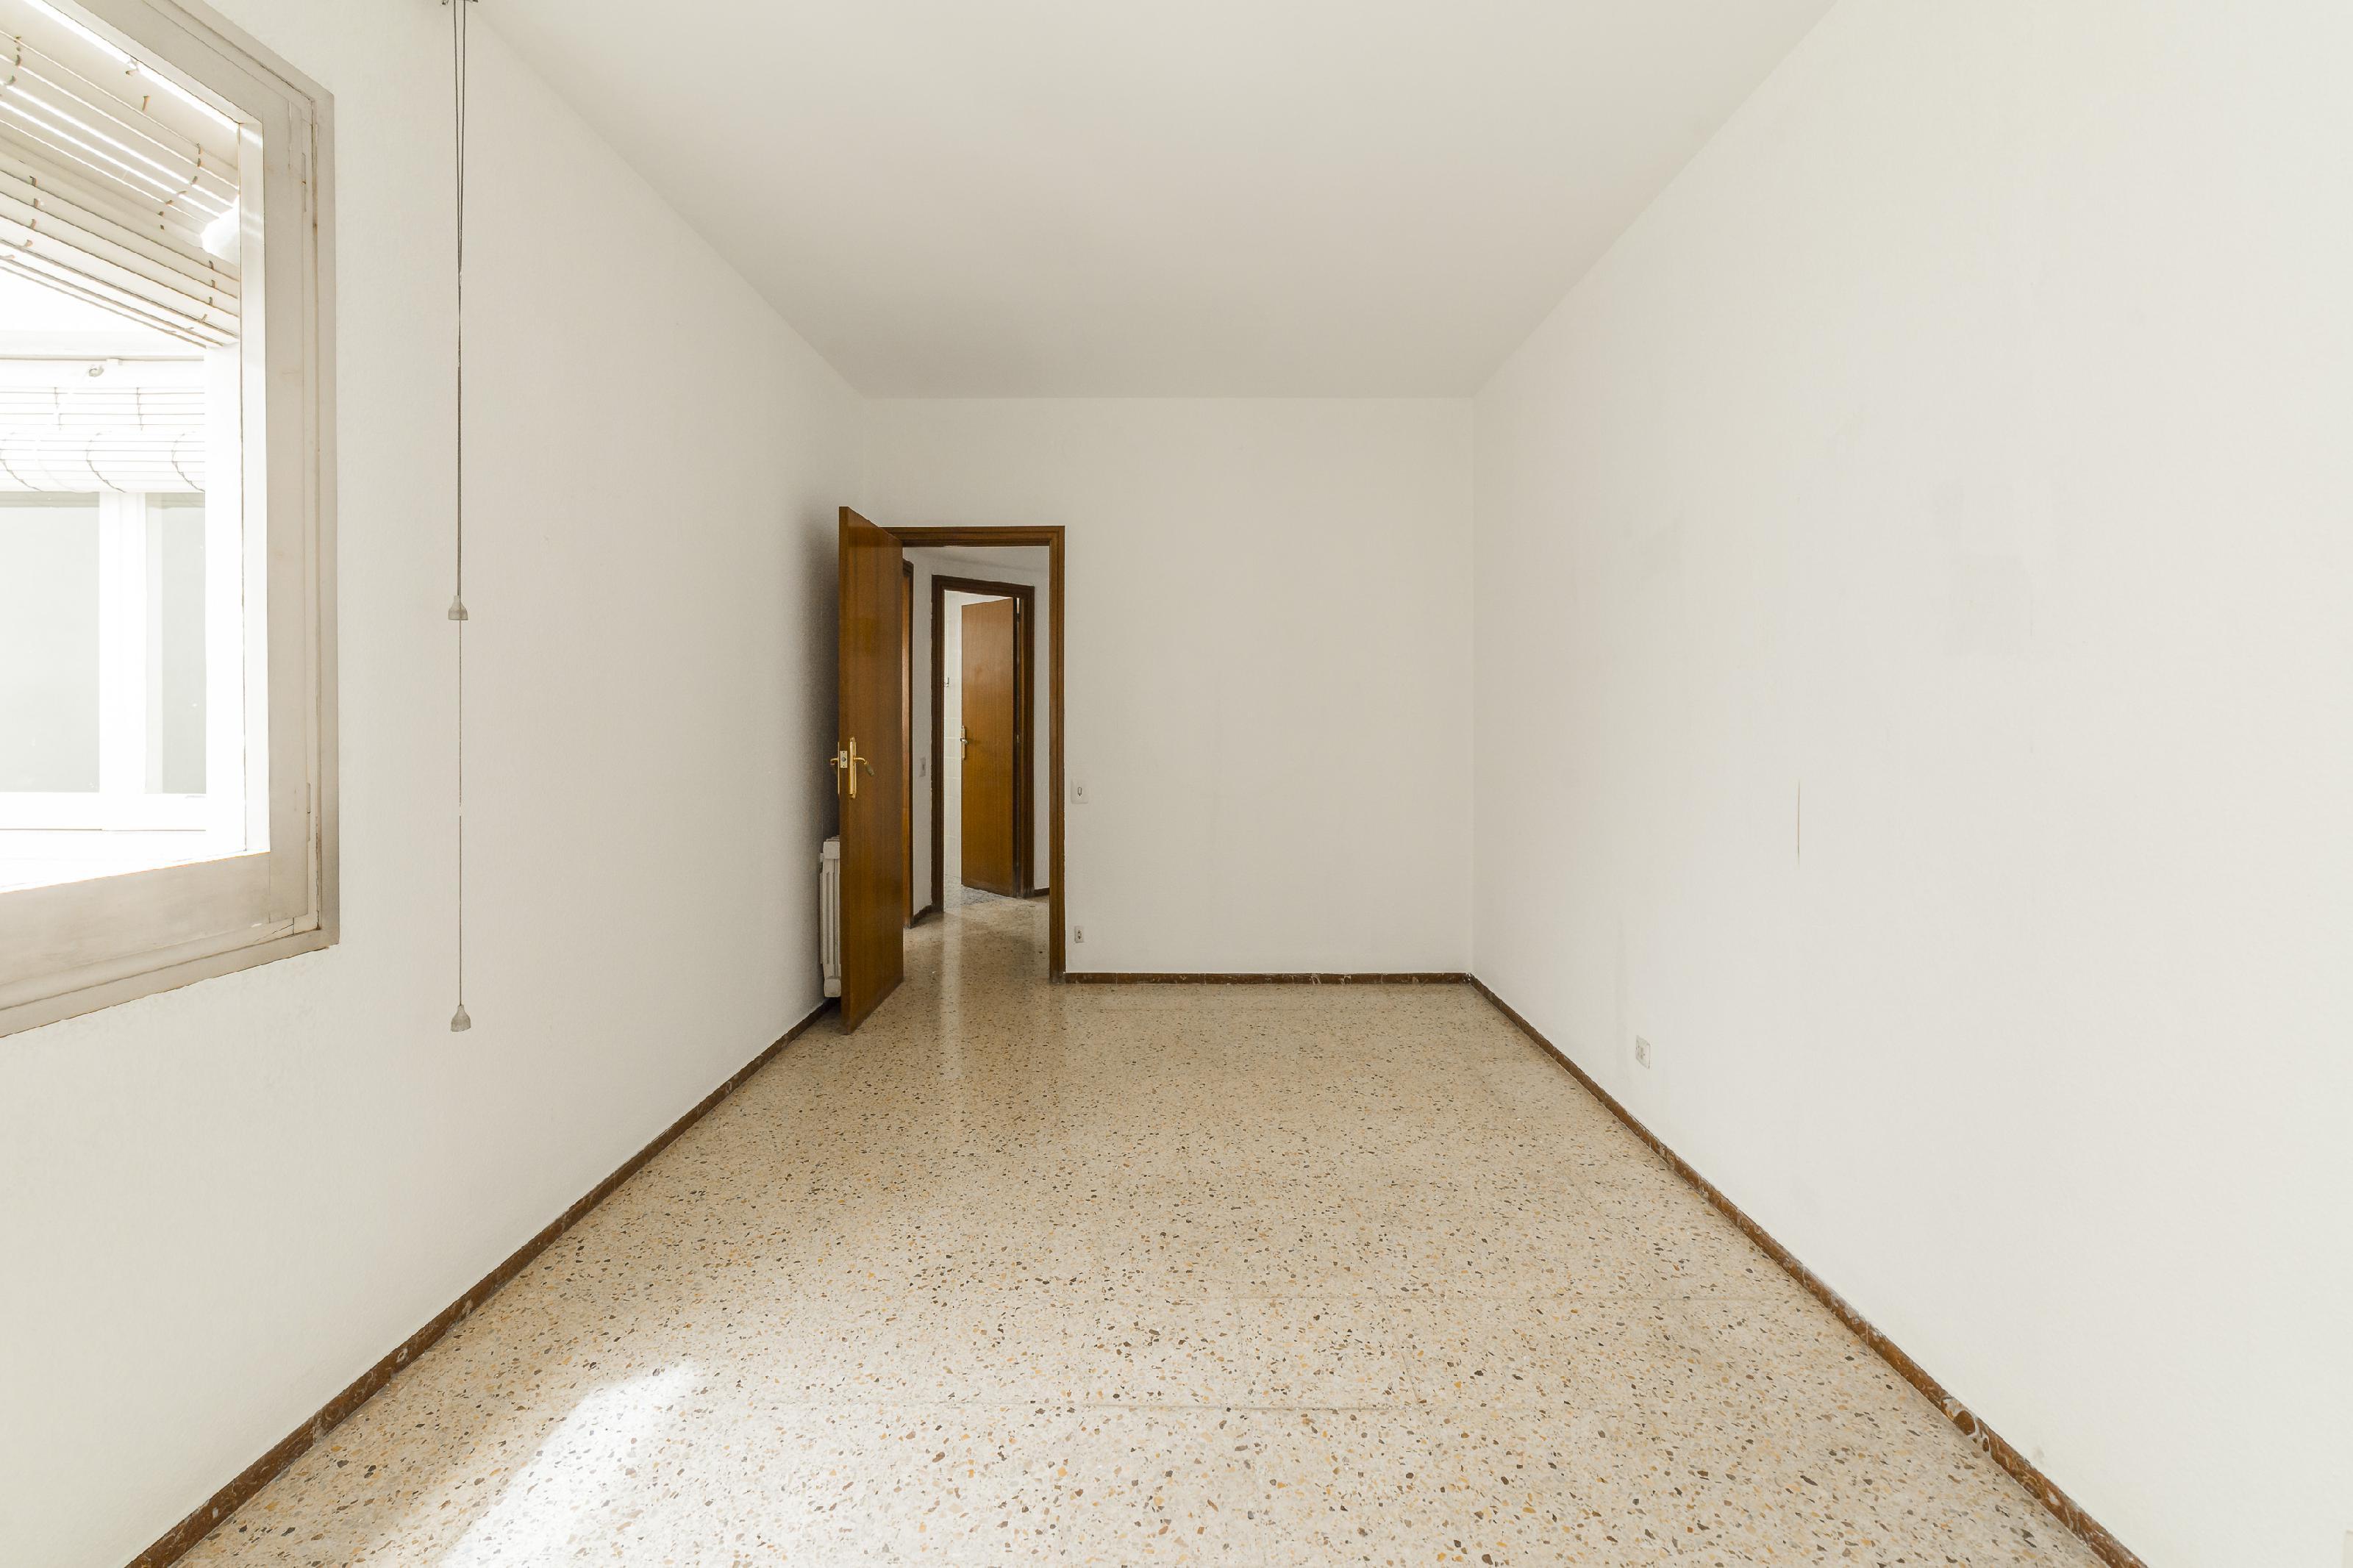 247624 Flat for sale in Eixample, Sant Antoni 15